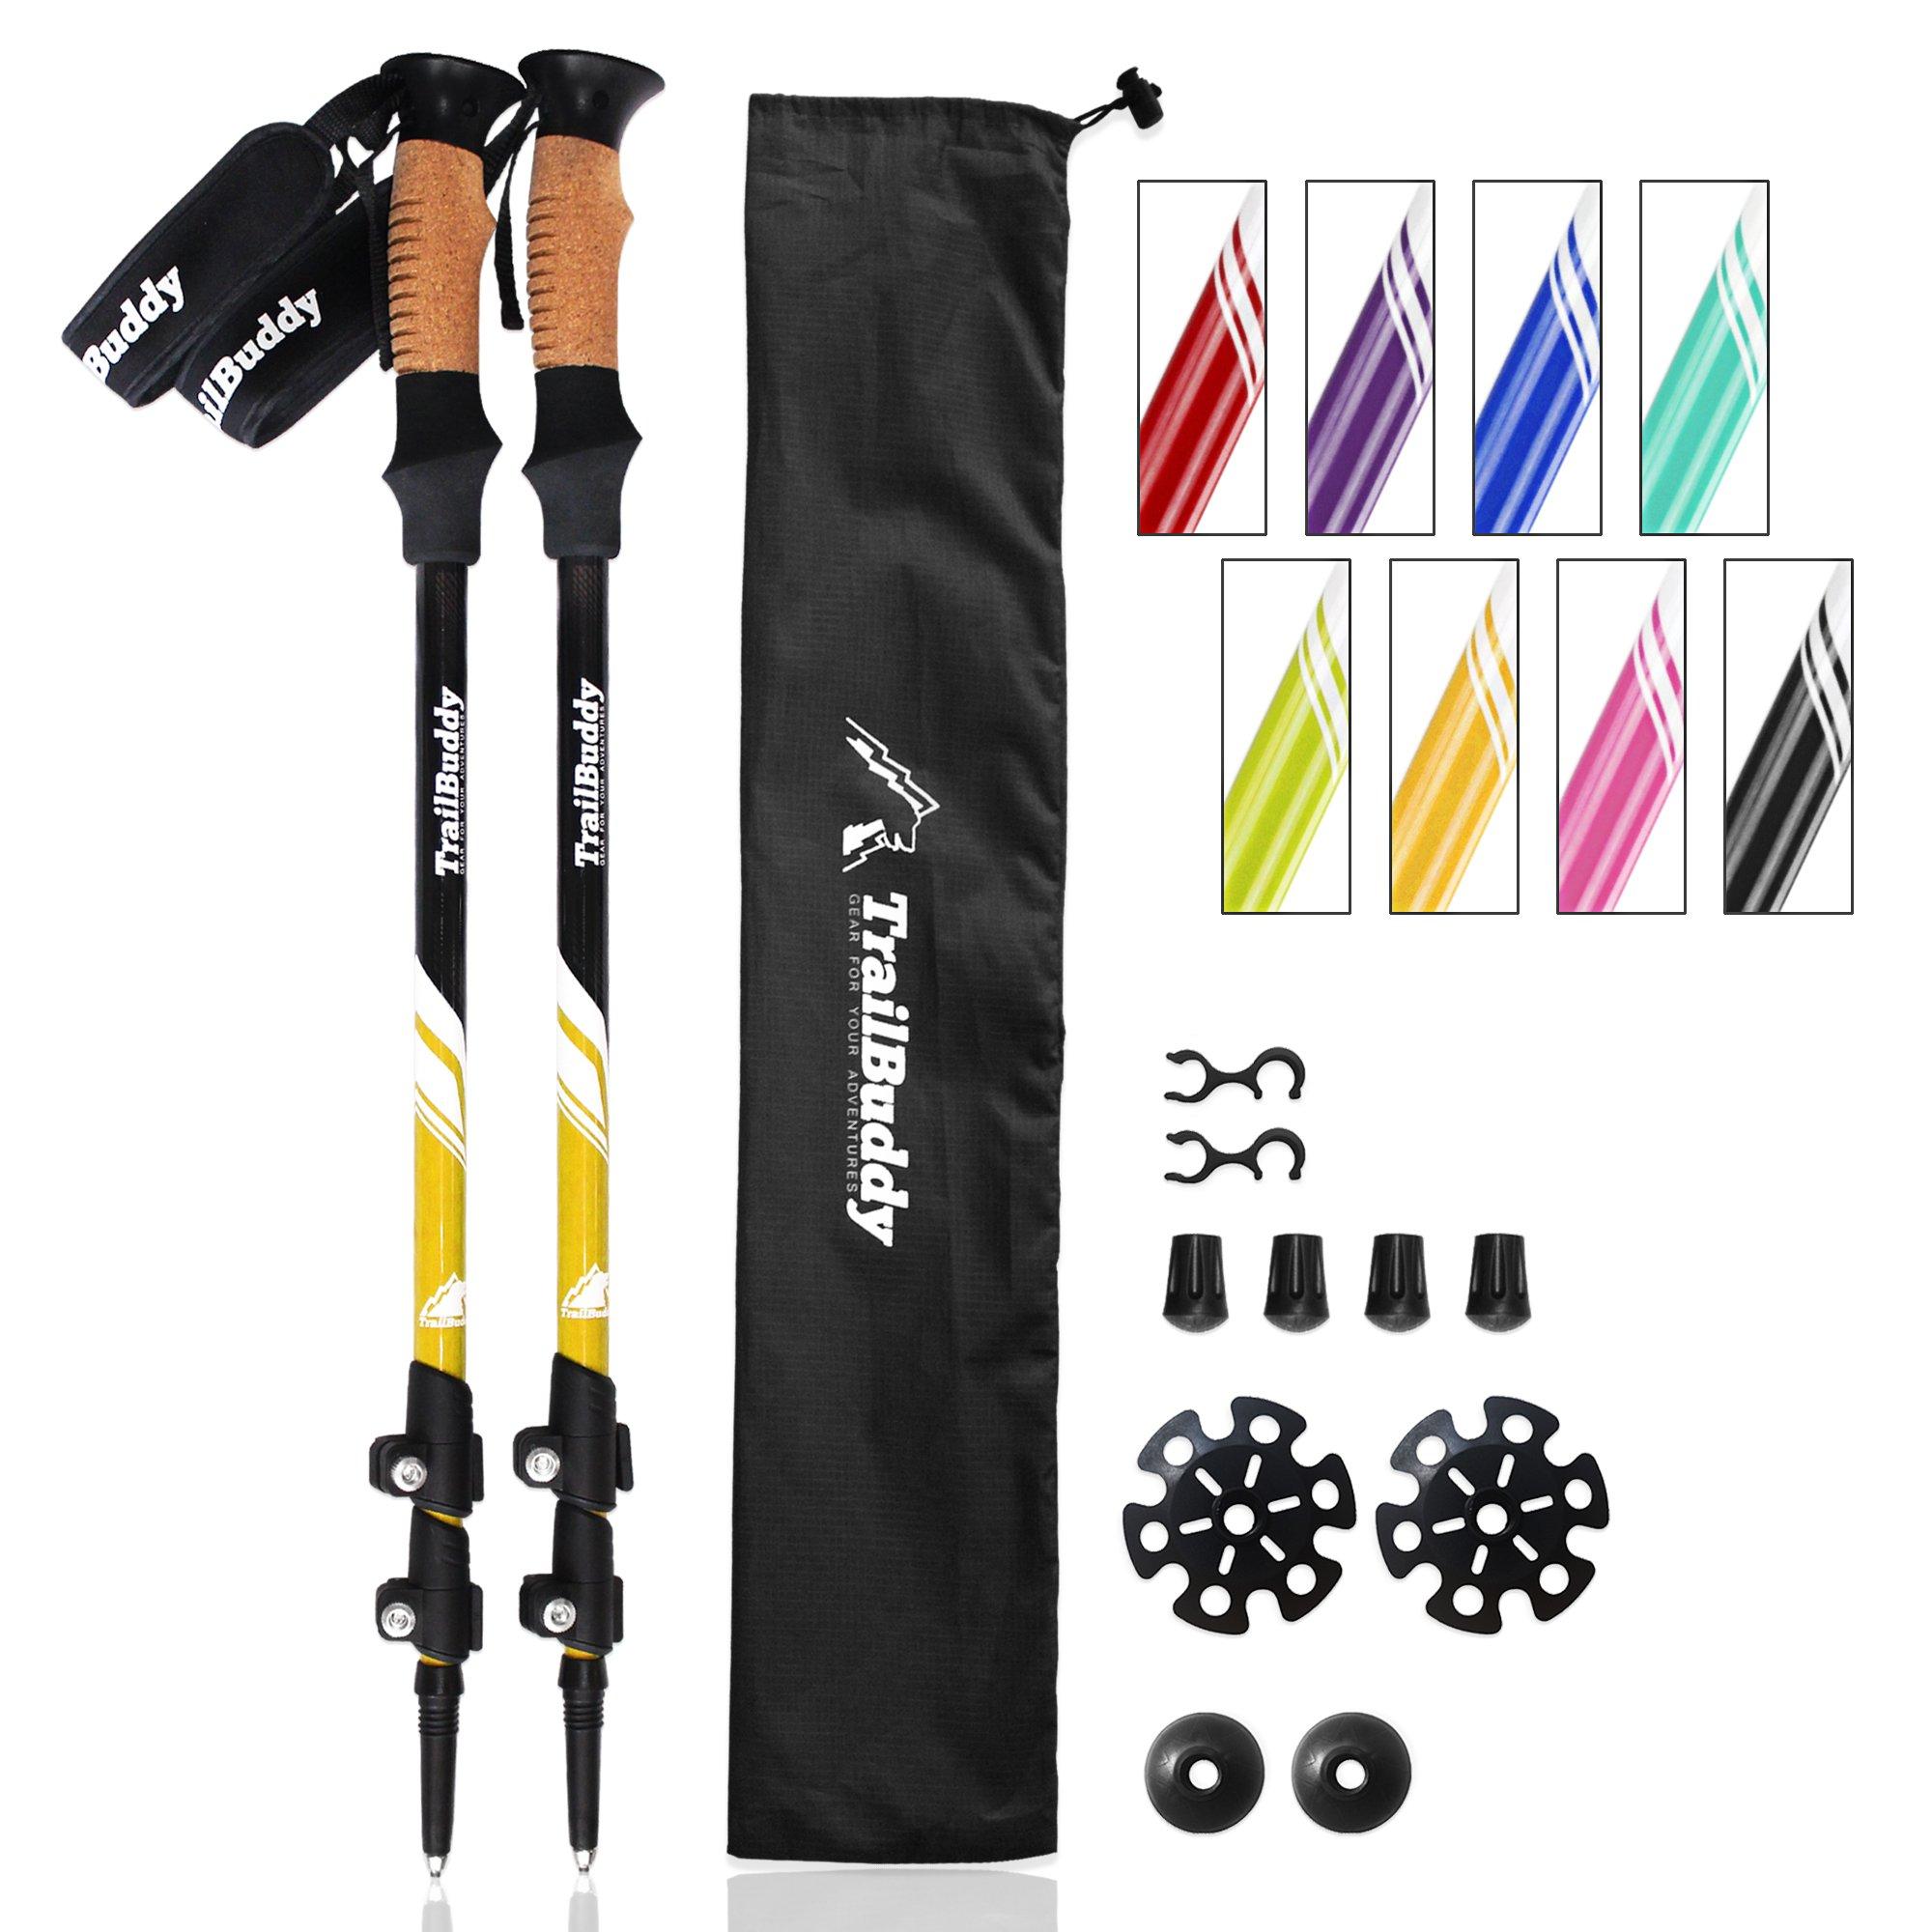 TrailBuddy Hiking Sticks - 2-pc Pack Adjustable Walking or Trekking Poles - Strong, Lightweight Aluminum 7075 - Quick Adjust Flip-Lock - Cork Grip, Padded Strap - (Bumblebee Yellow)